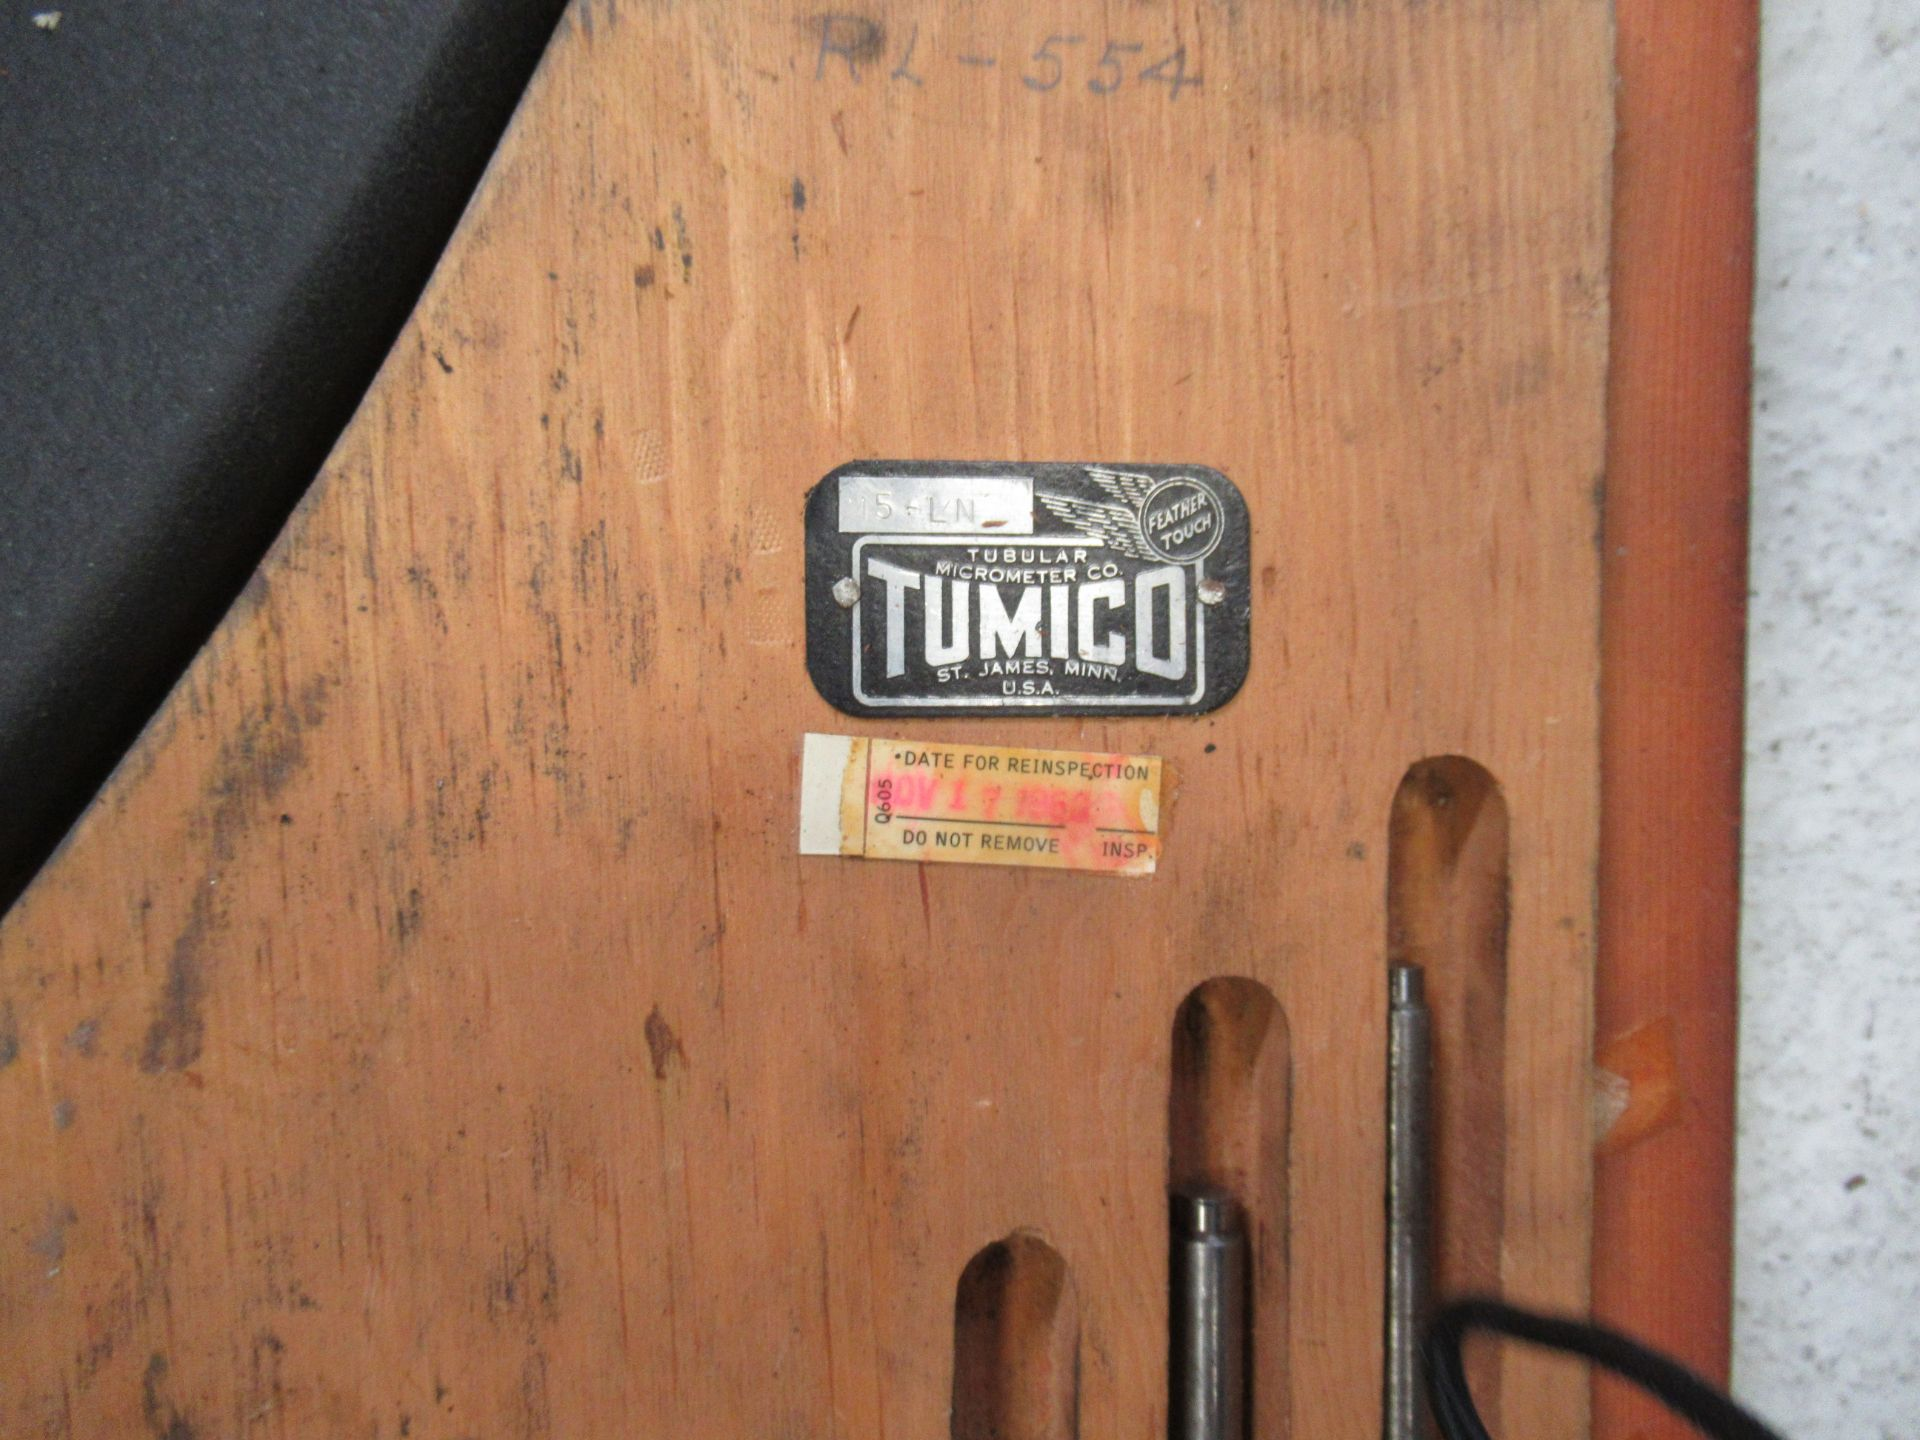 "TUMICO 30""-36"" MICROMETER - Image 3 of 3"